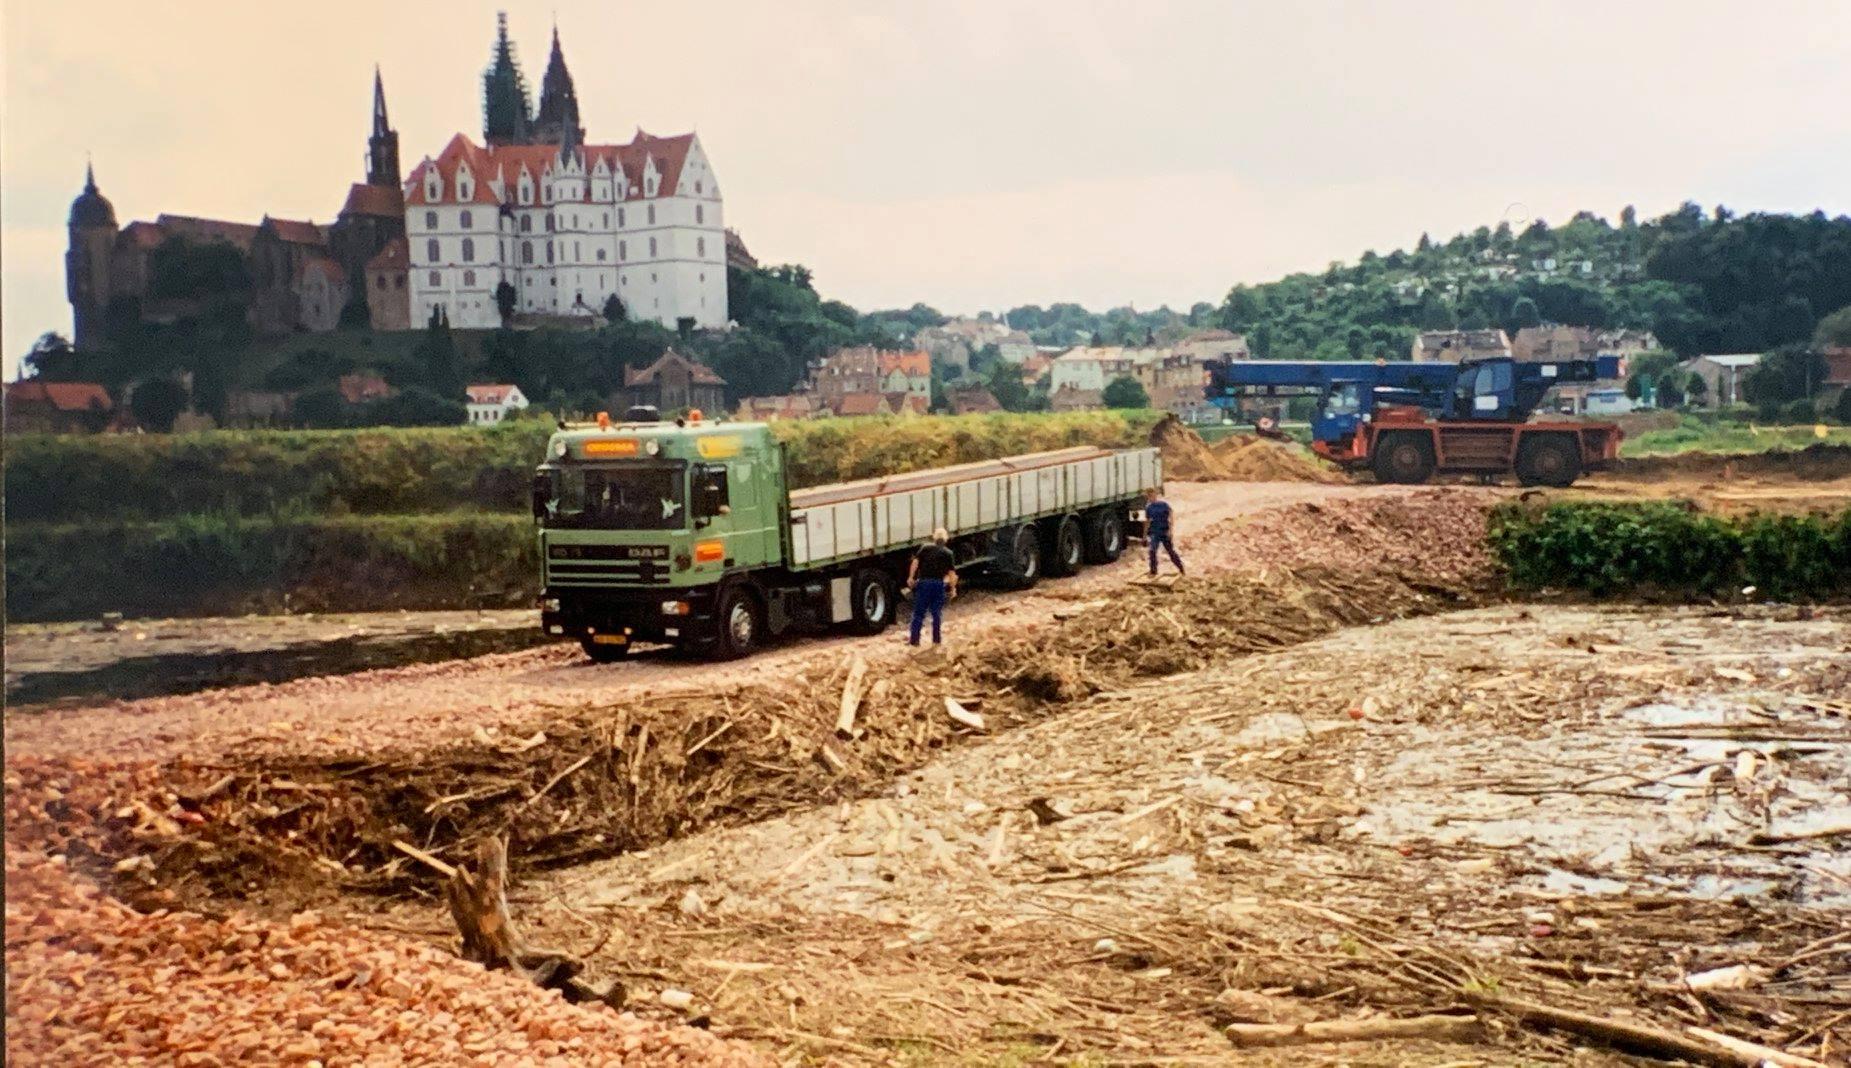 1996-Martin-Kardol-en-Audrey-naar-DDR--2